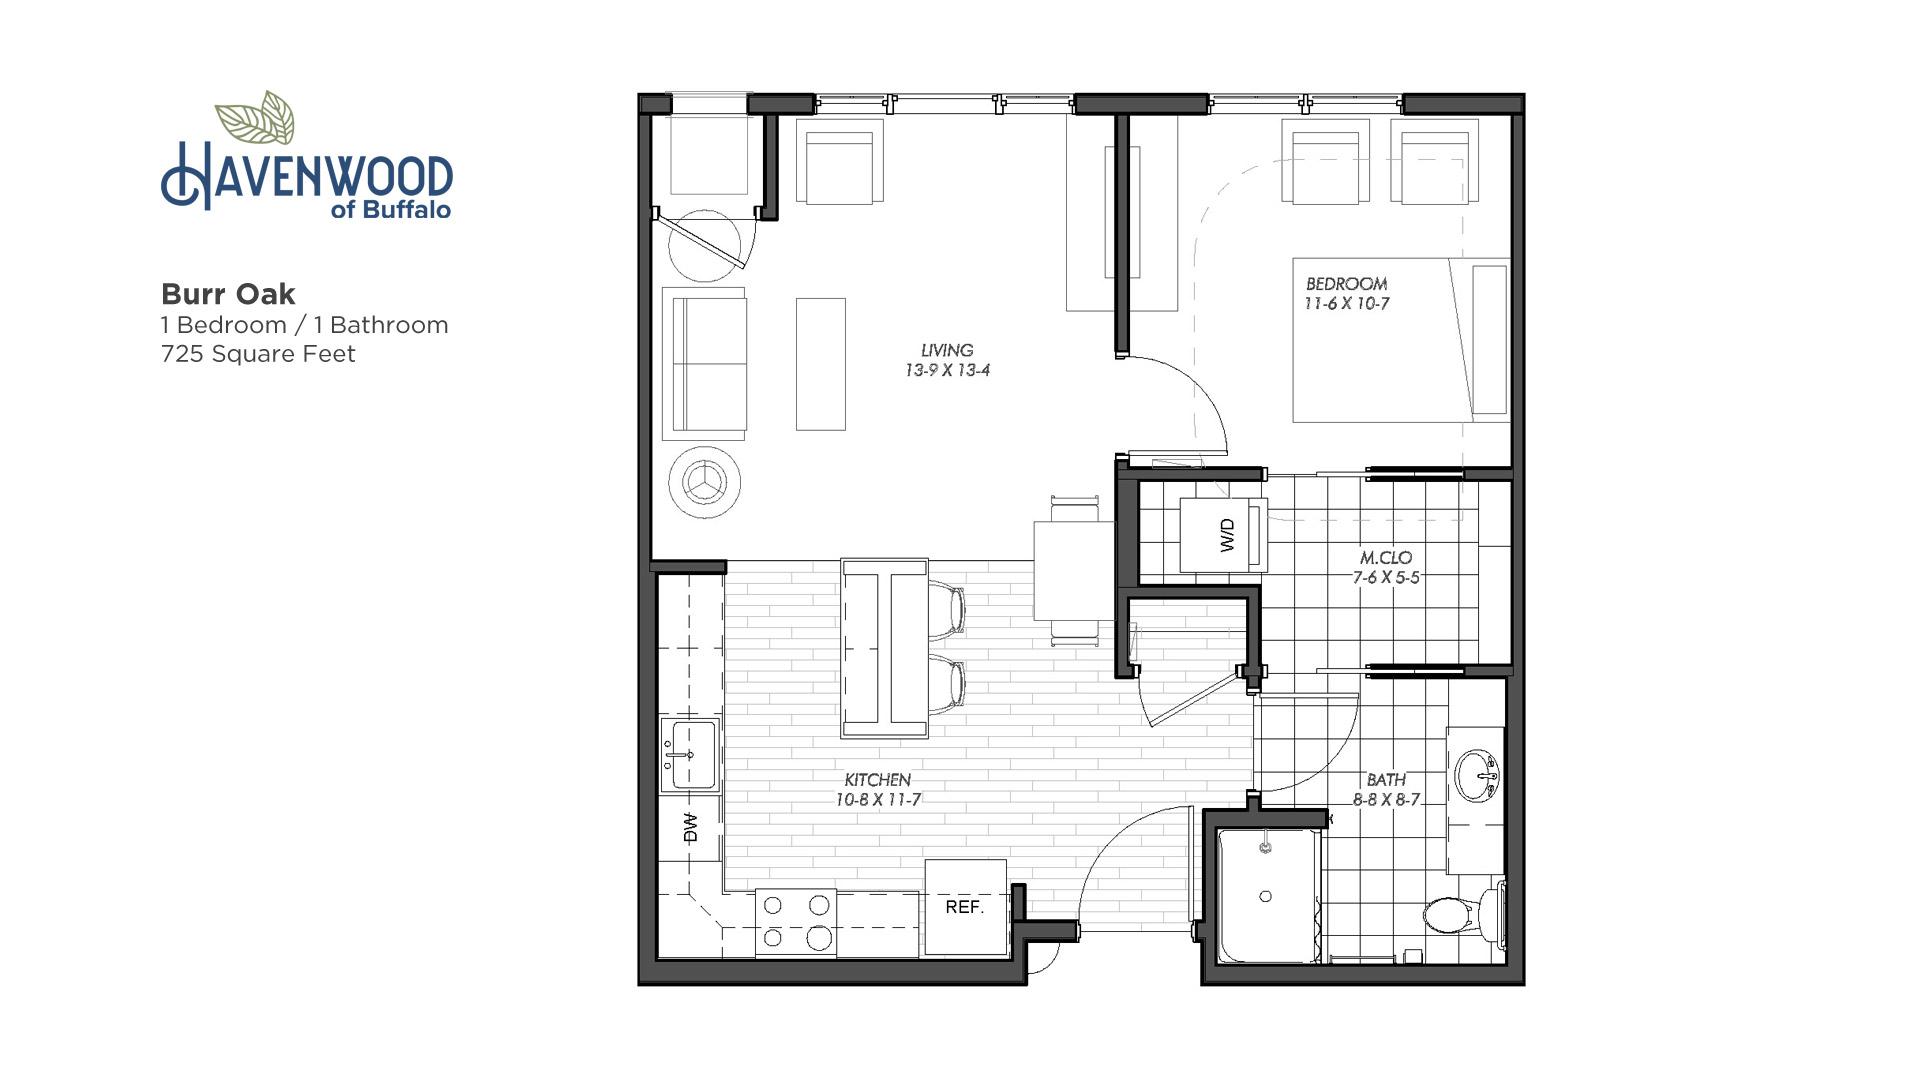 Havenwood of Buffalo Burr Oak Floor Plan